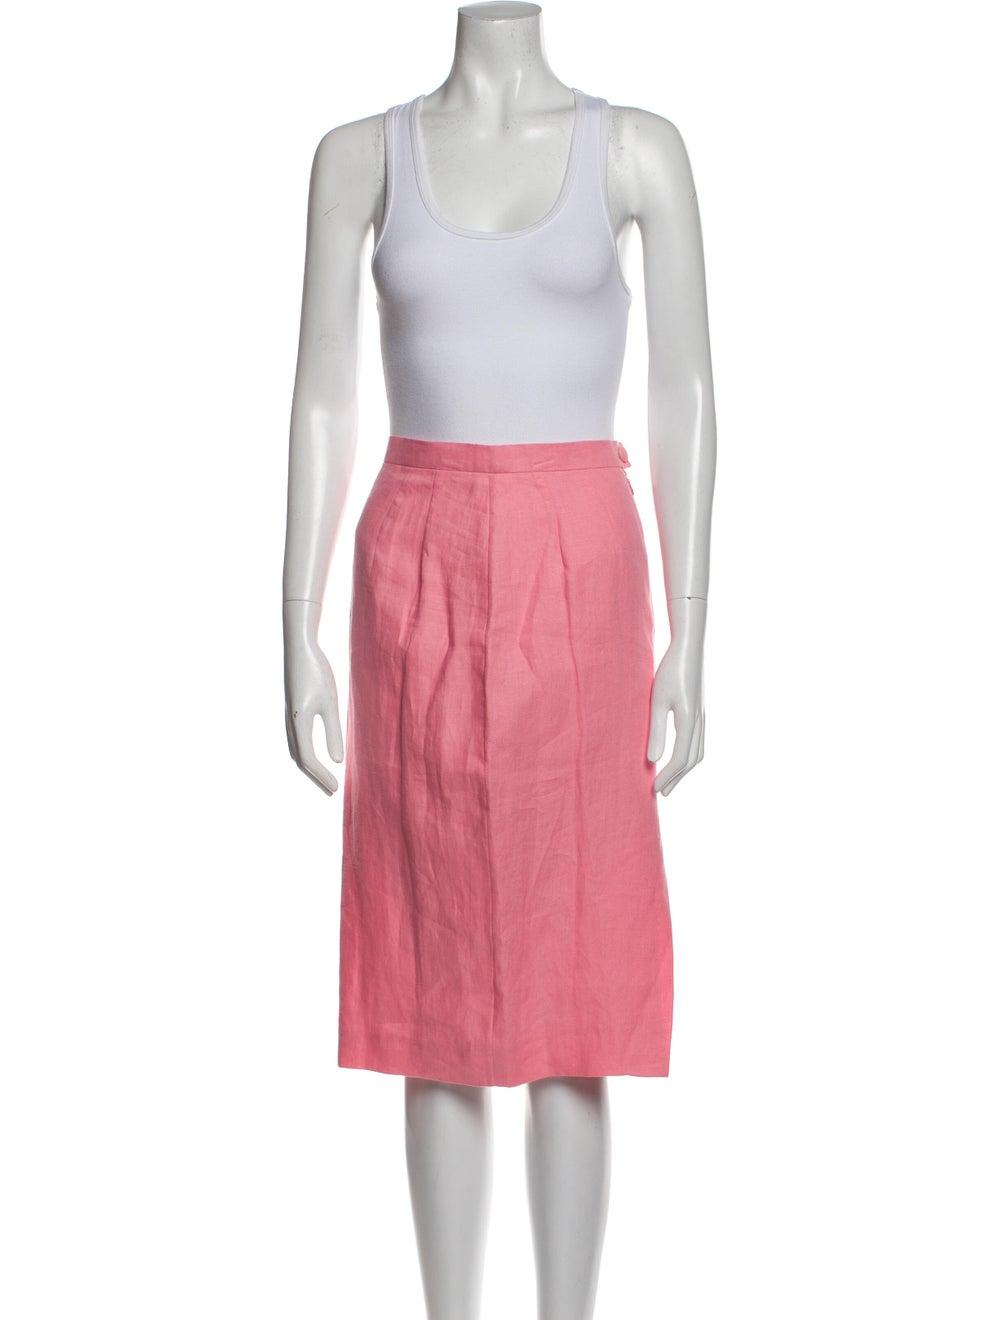 Kenzo Vintage Linen Skirt Suit Pink - image 4